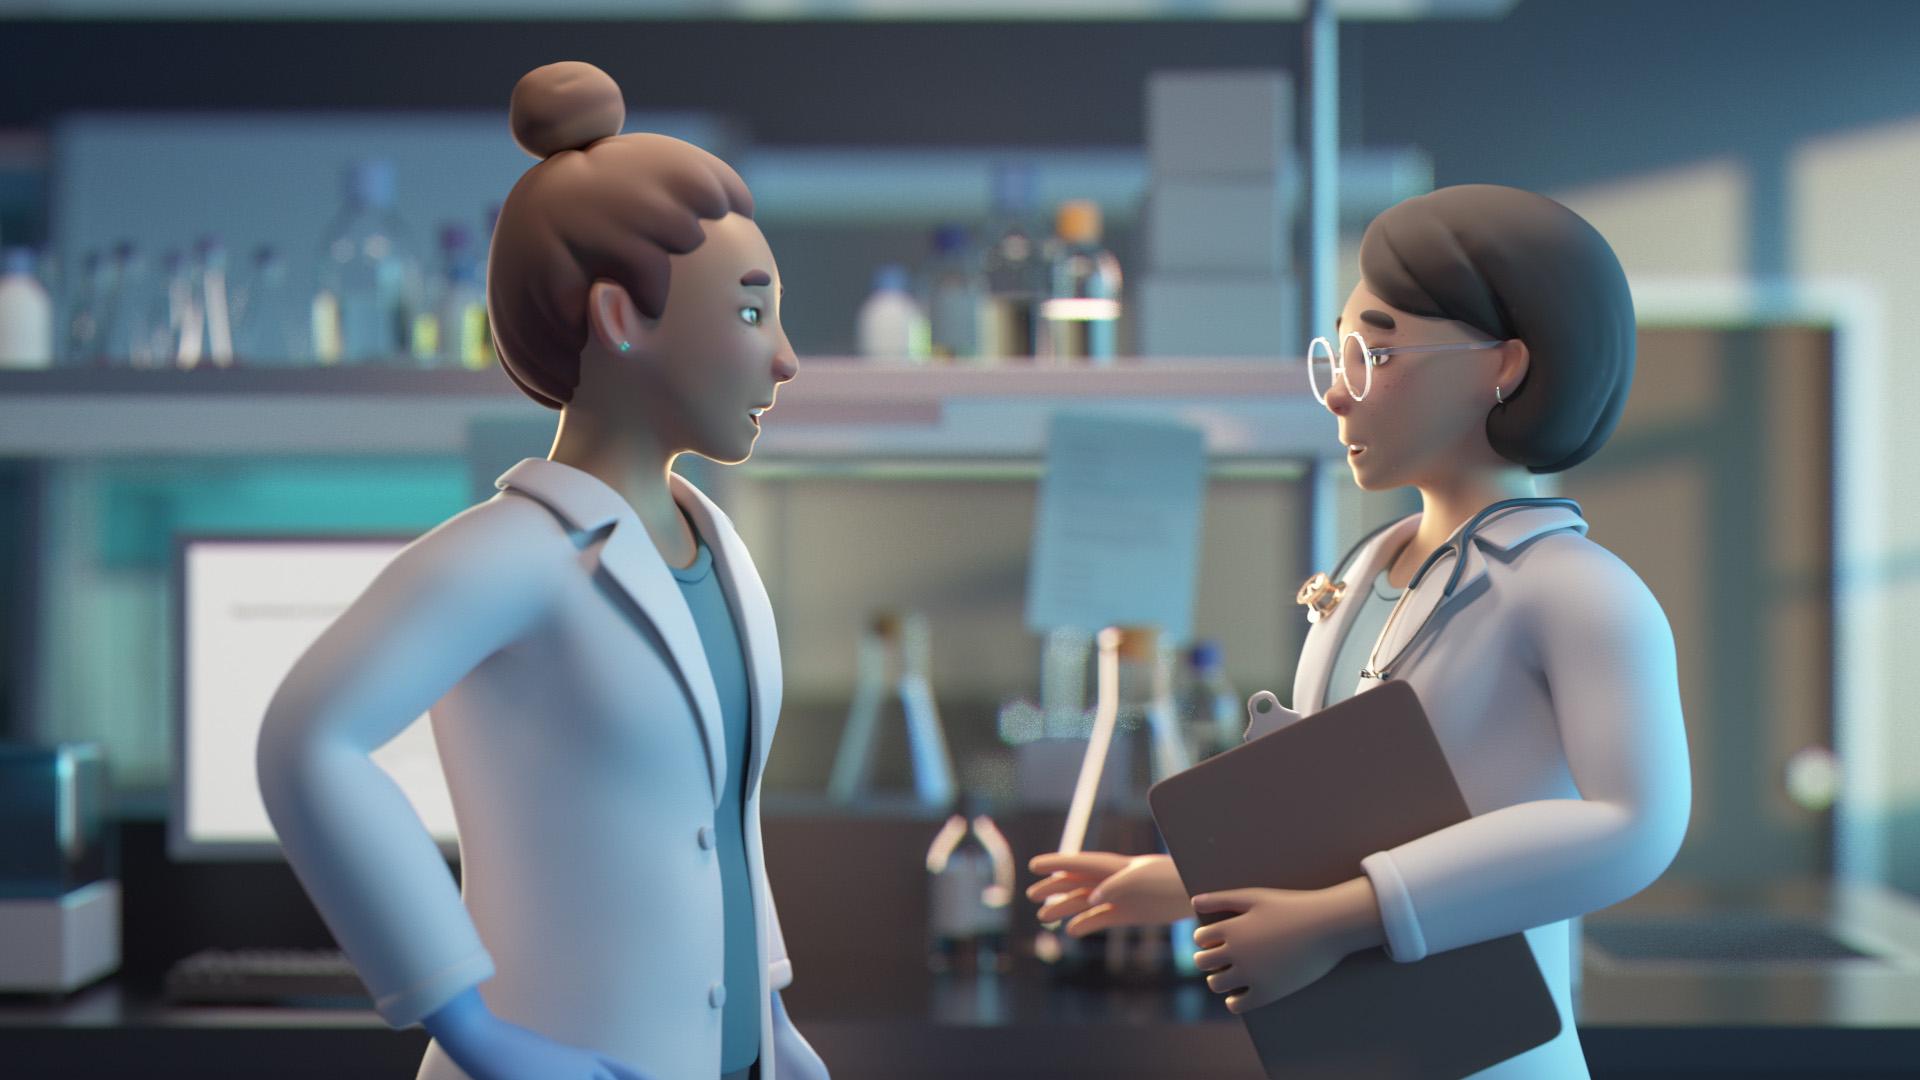 axs-studio-medical-animation-multiple-myeloma-laboratory-research